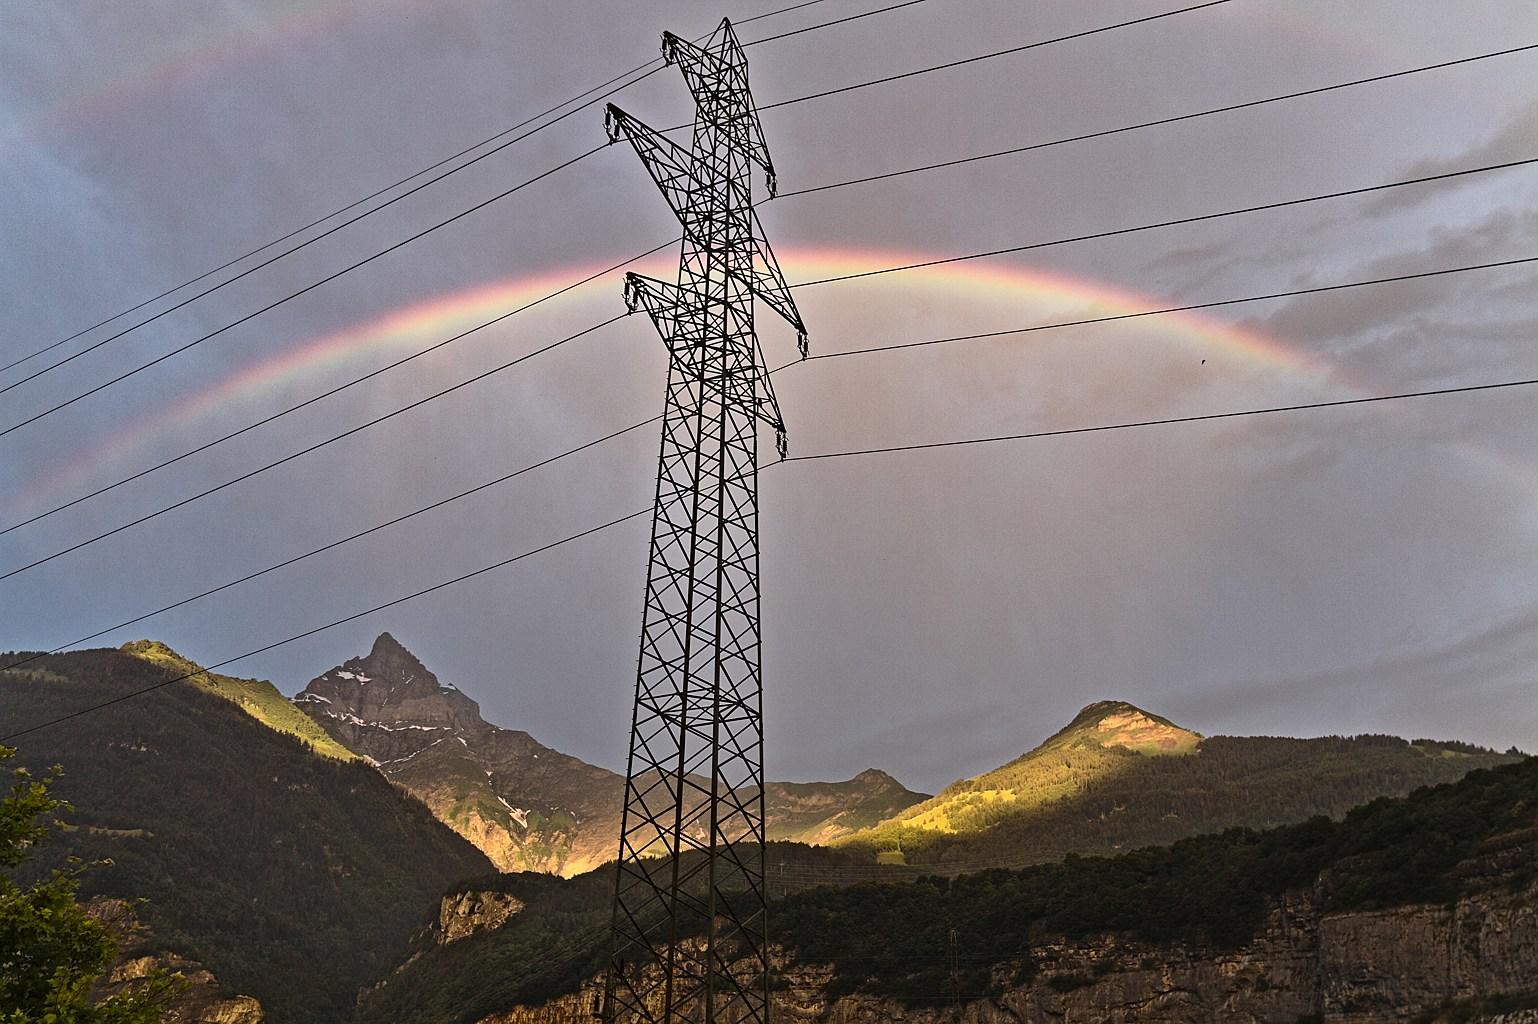 180705_0338 - Dents Du Midi - Rainbow